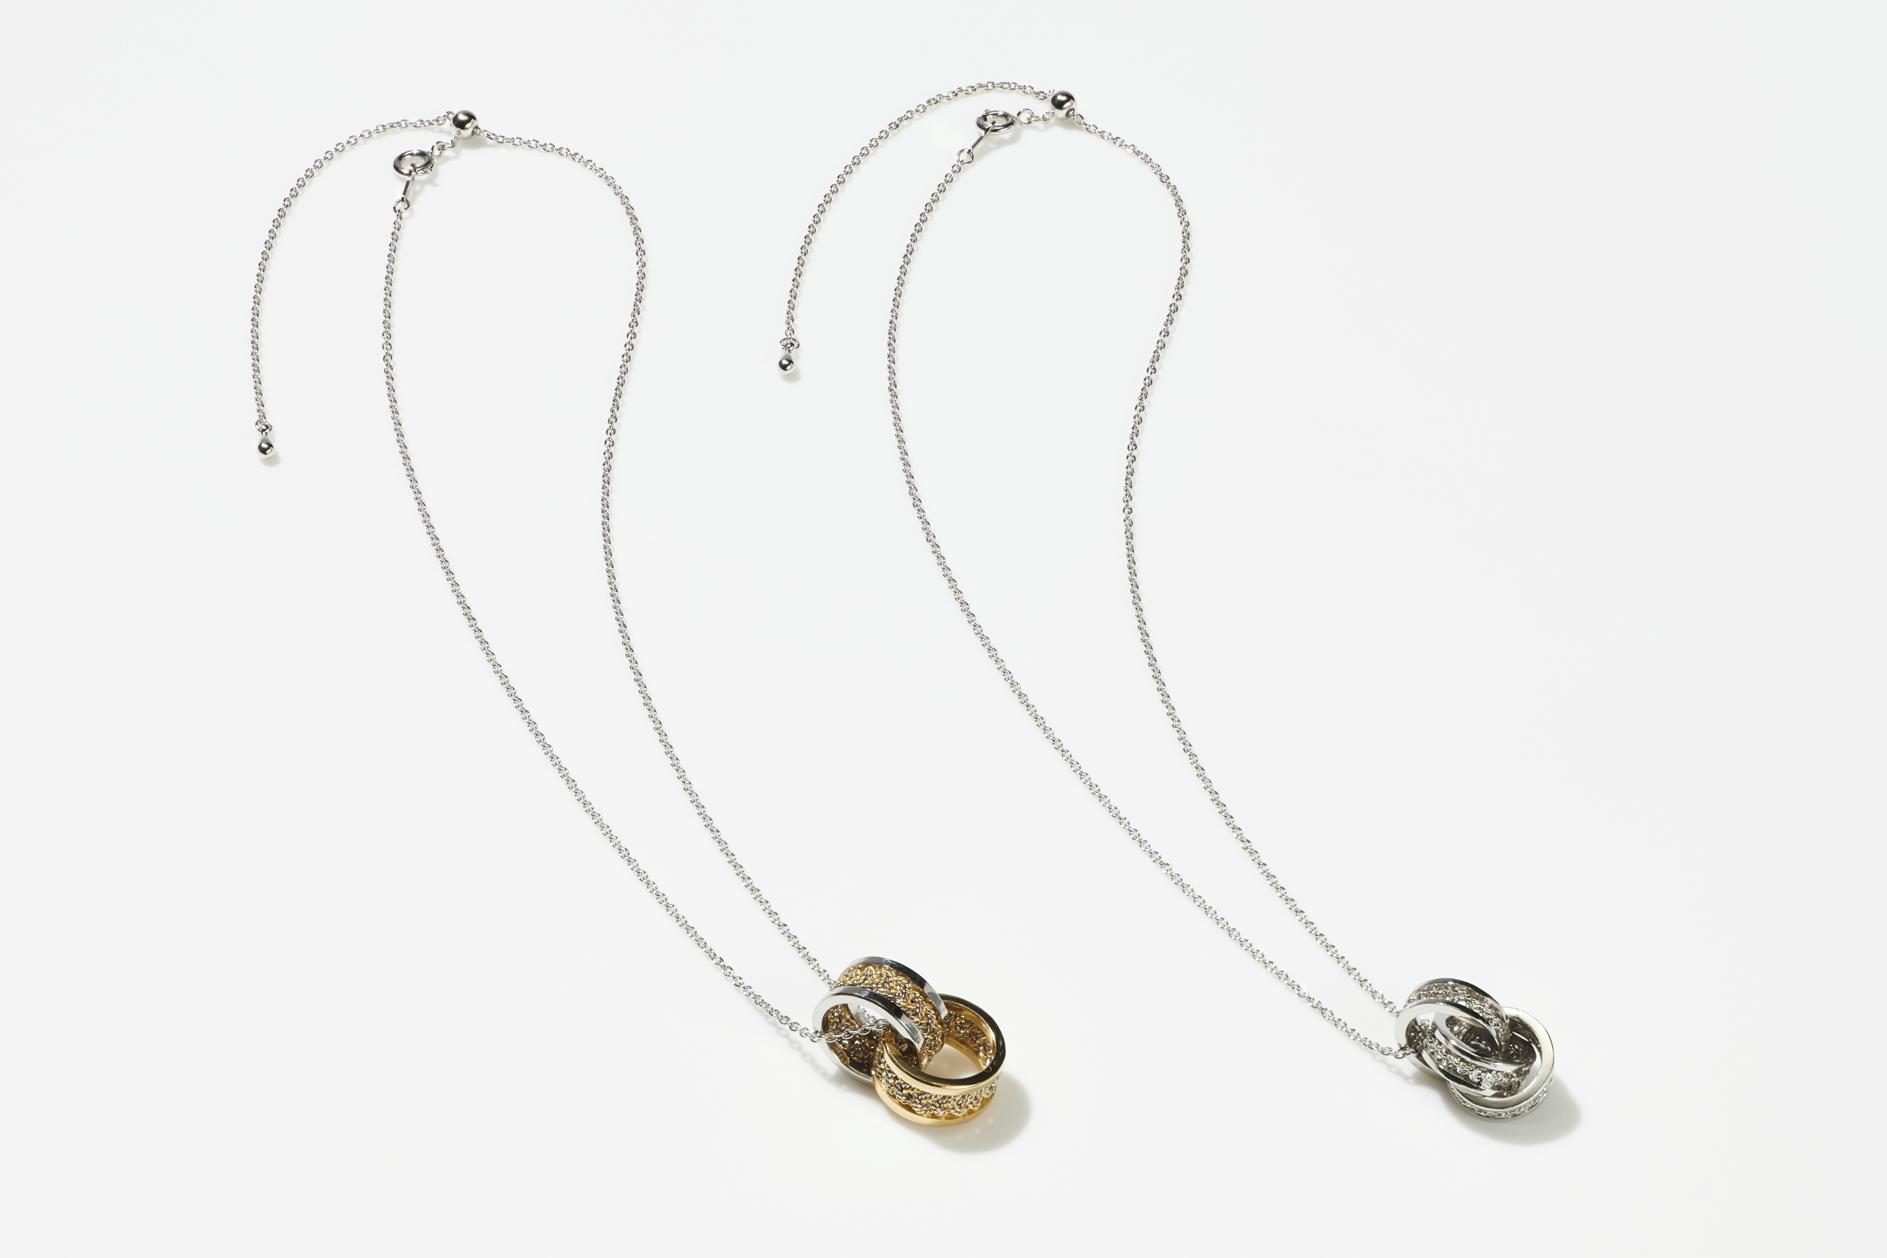 Hand-Weaving Jewellery Pendant